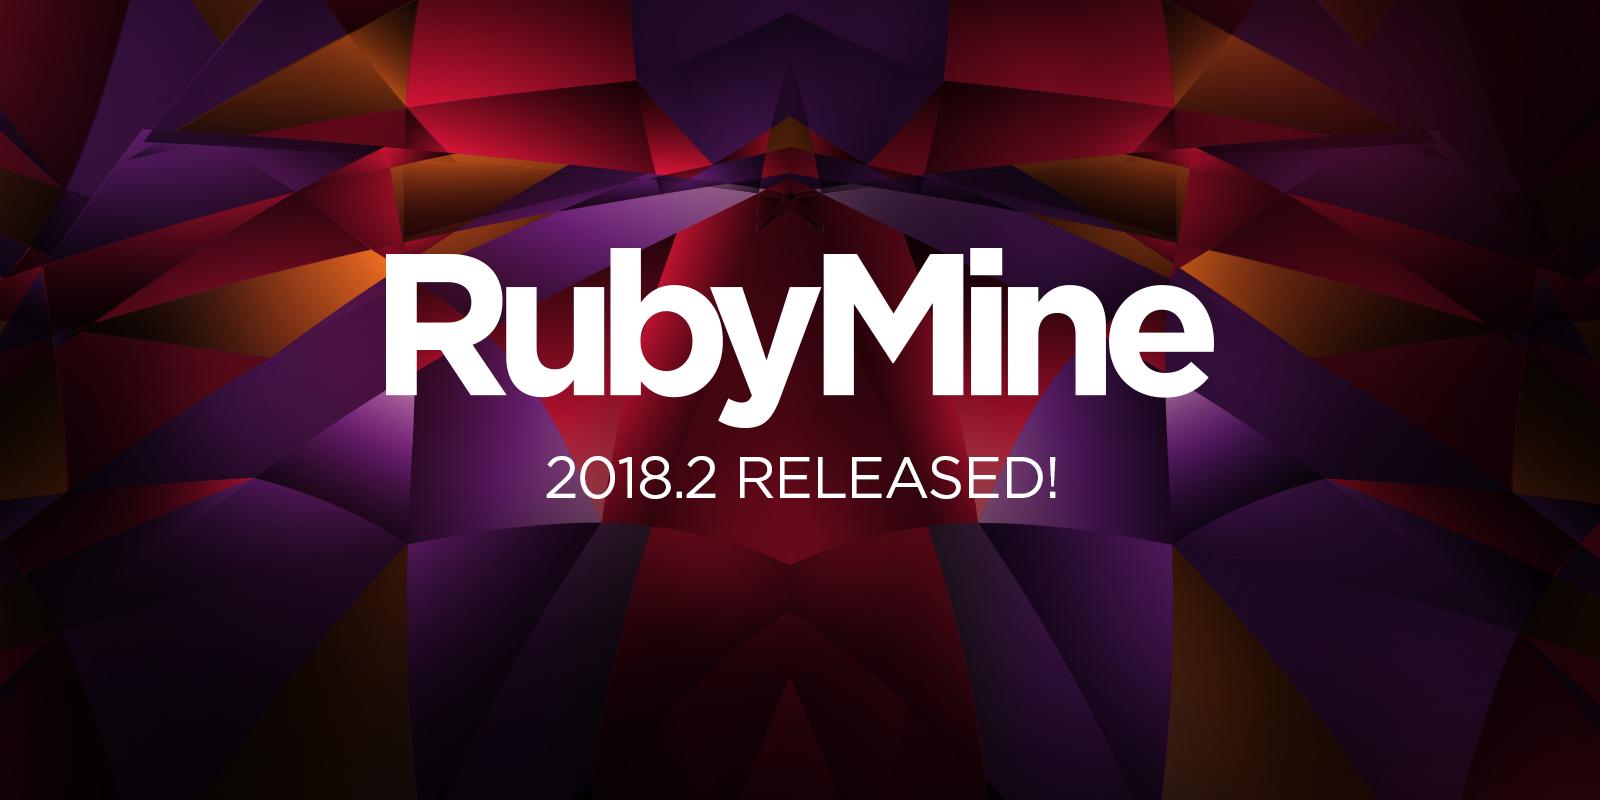 rubymine-2018.2-release